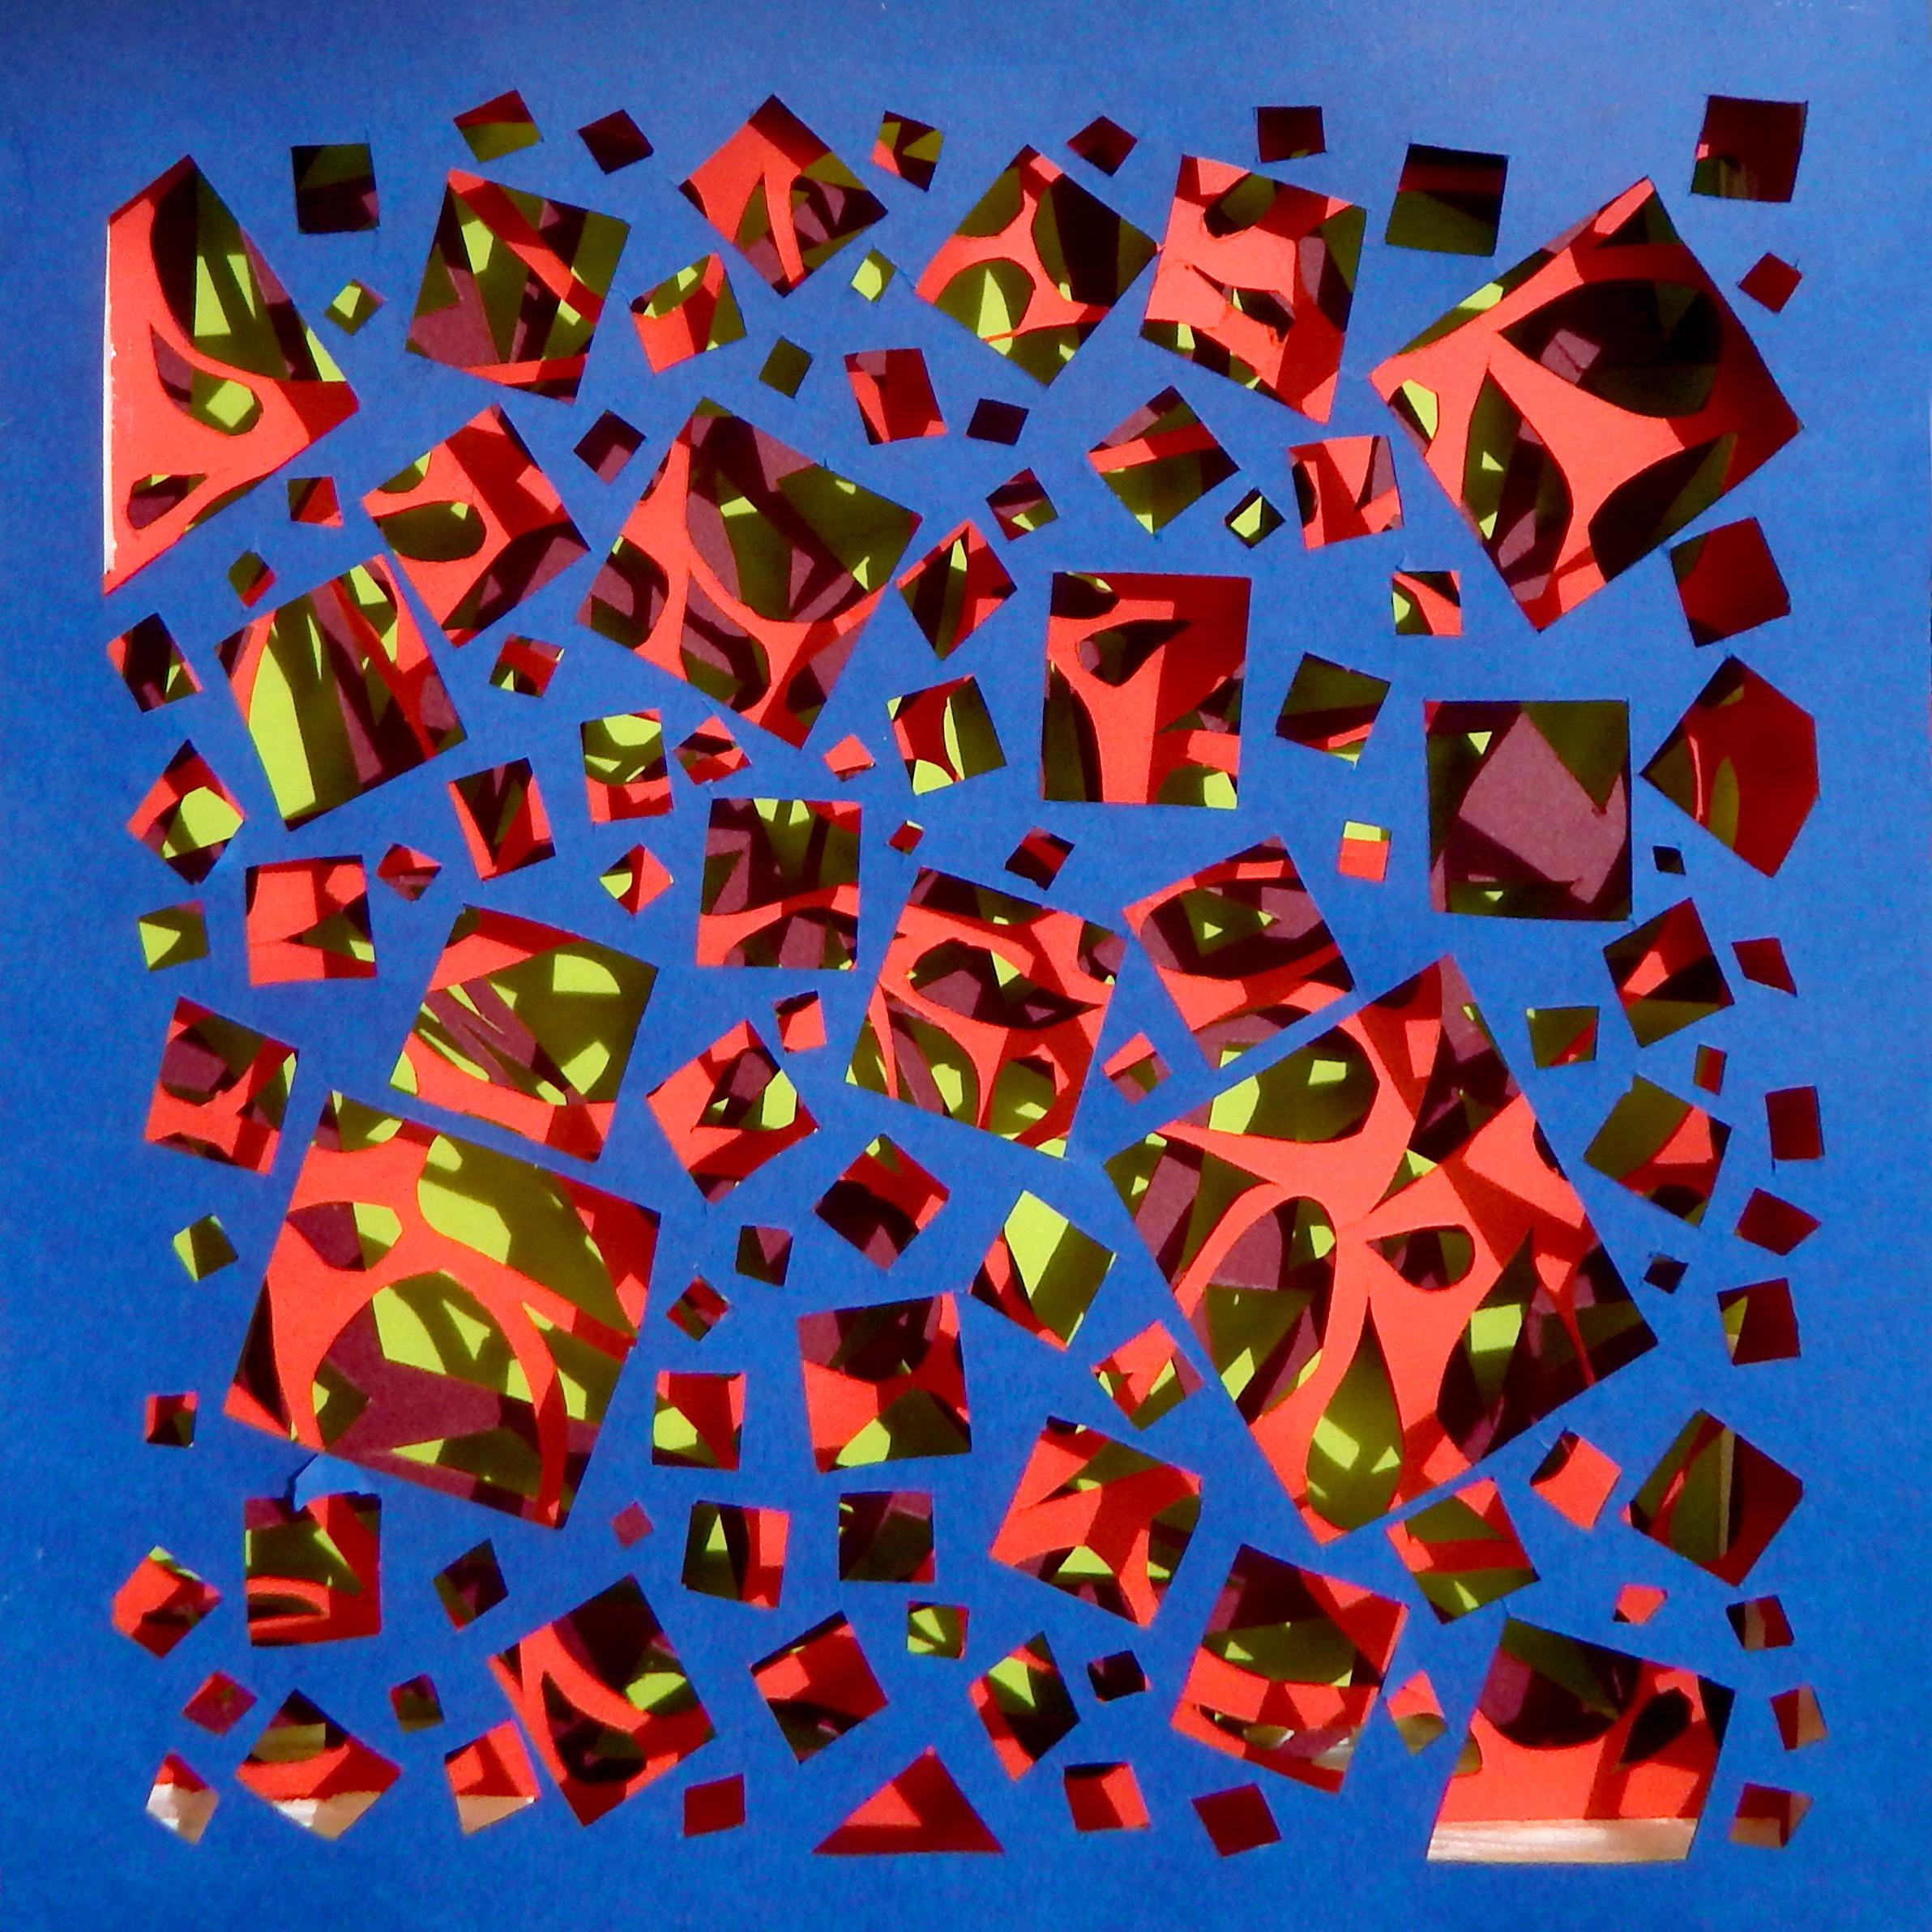 shadowbox_geometric2.jpg